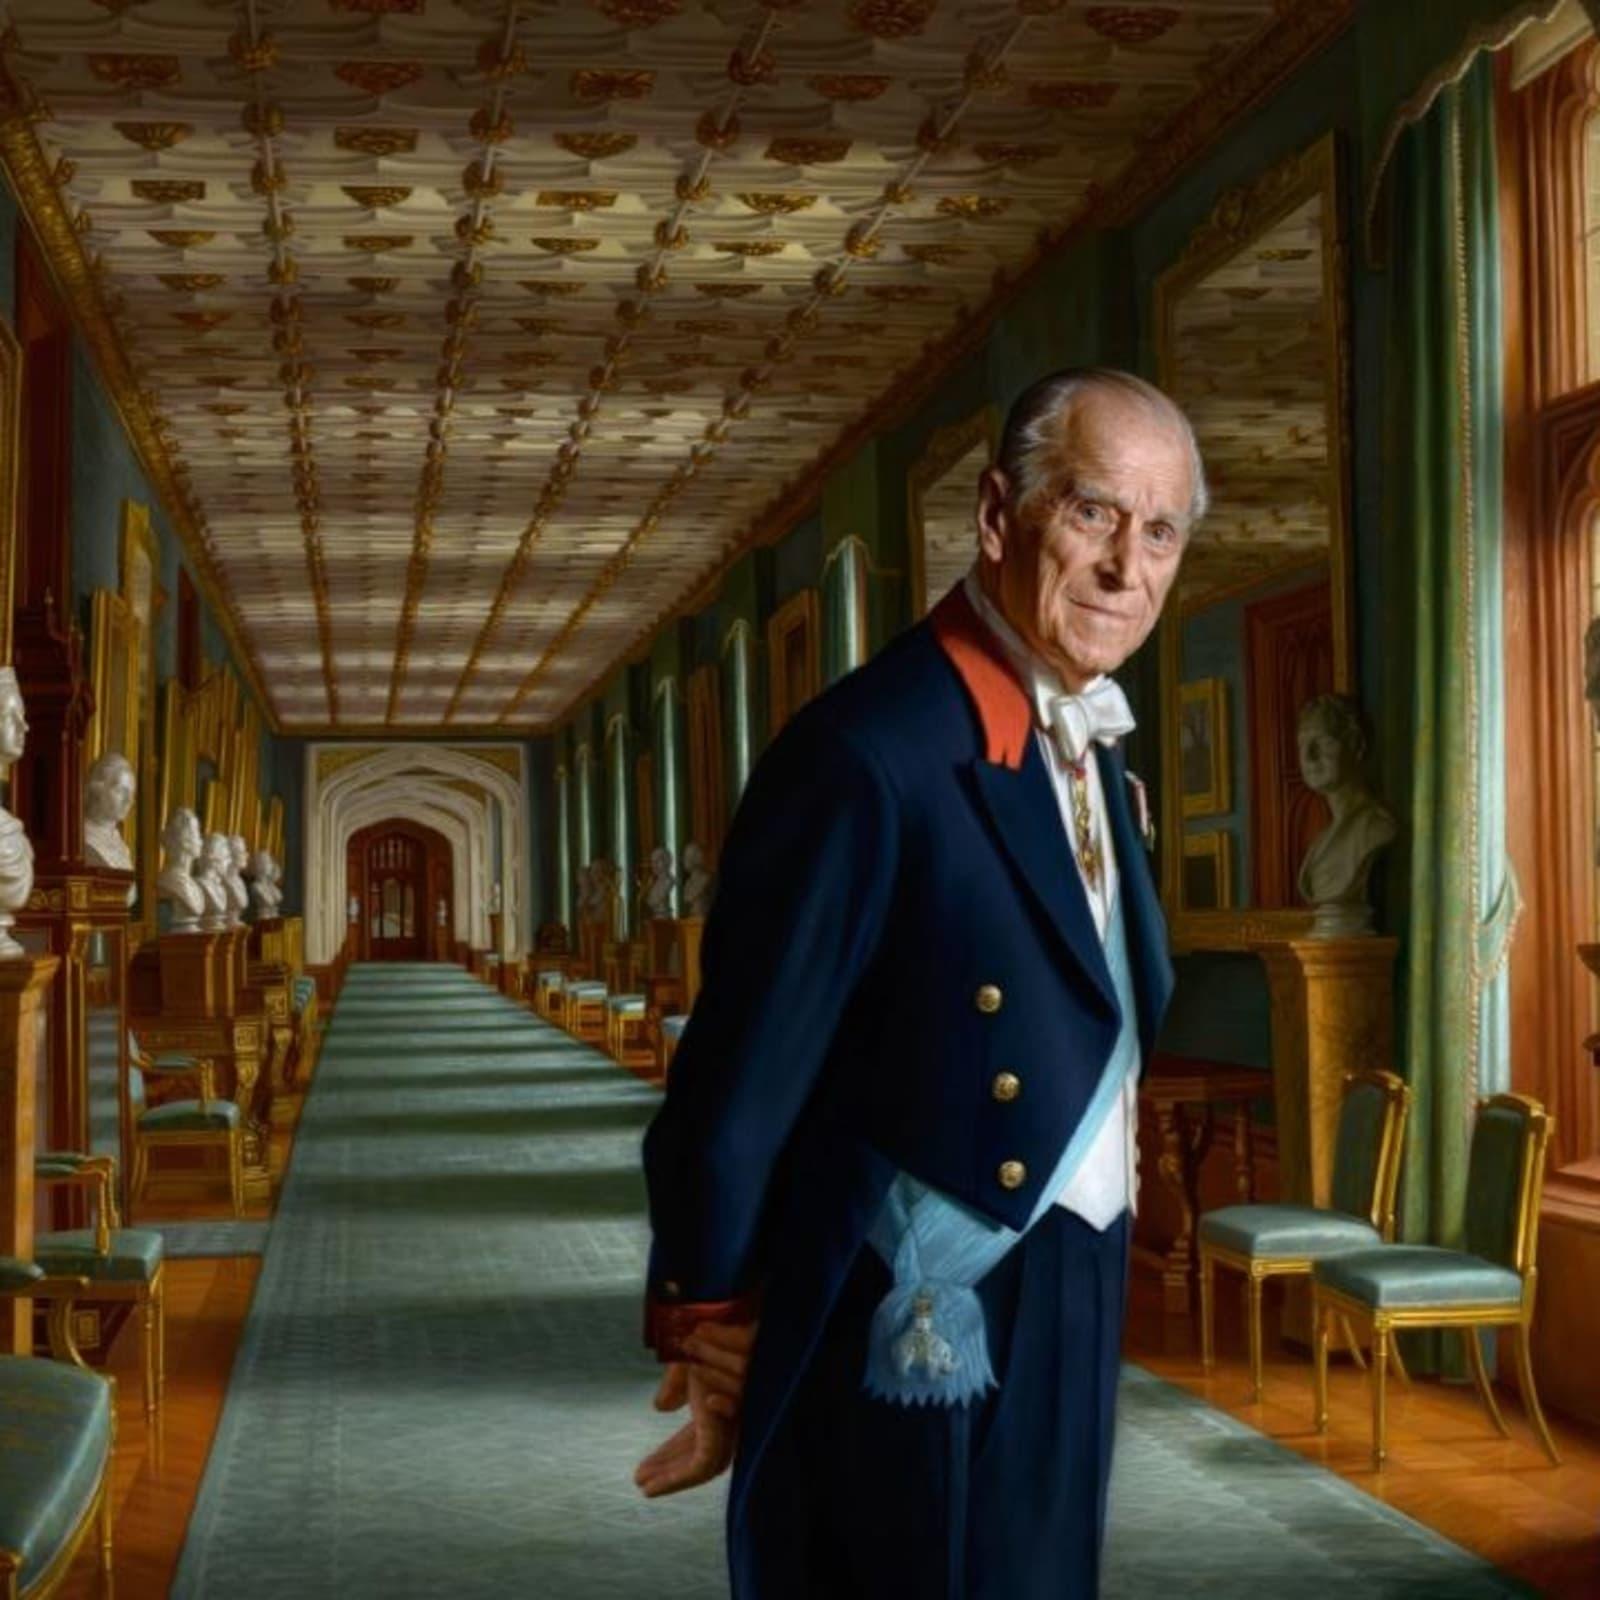 Ralph Heimans, Portrait of HRH The Duke of Edinburgh, 2017 Oil on canvas, 160 x 230cm © Ralph Heimans